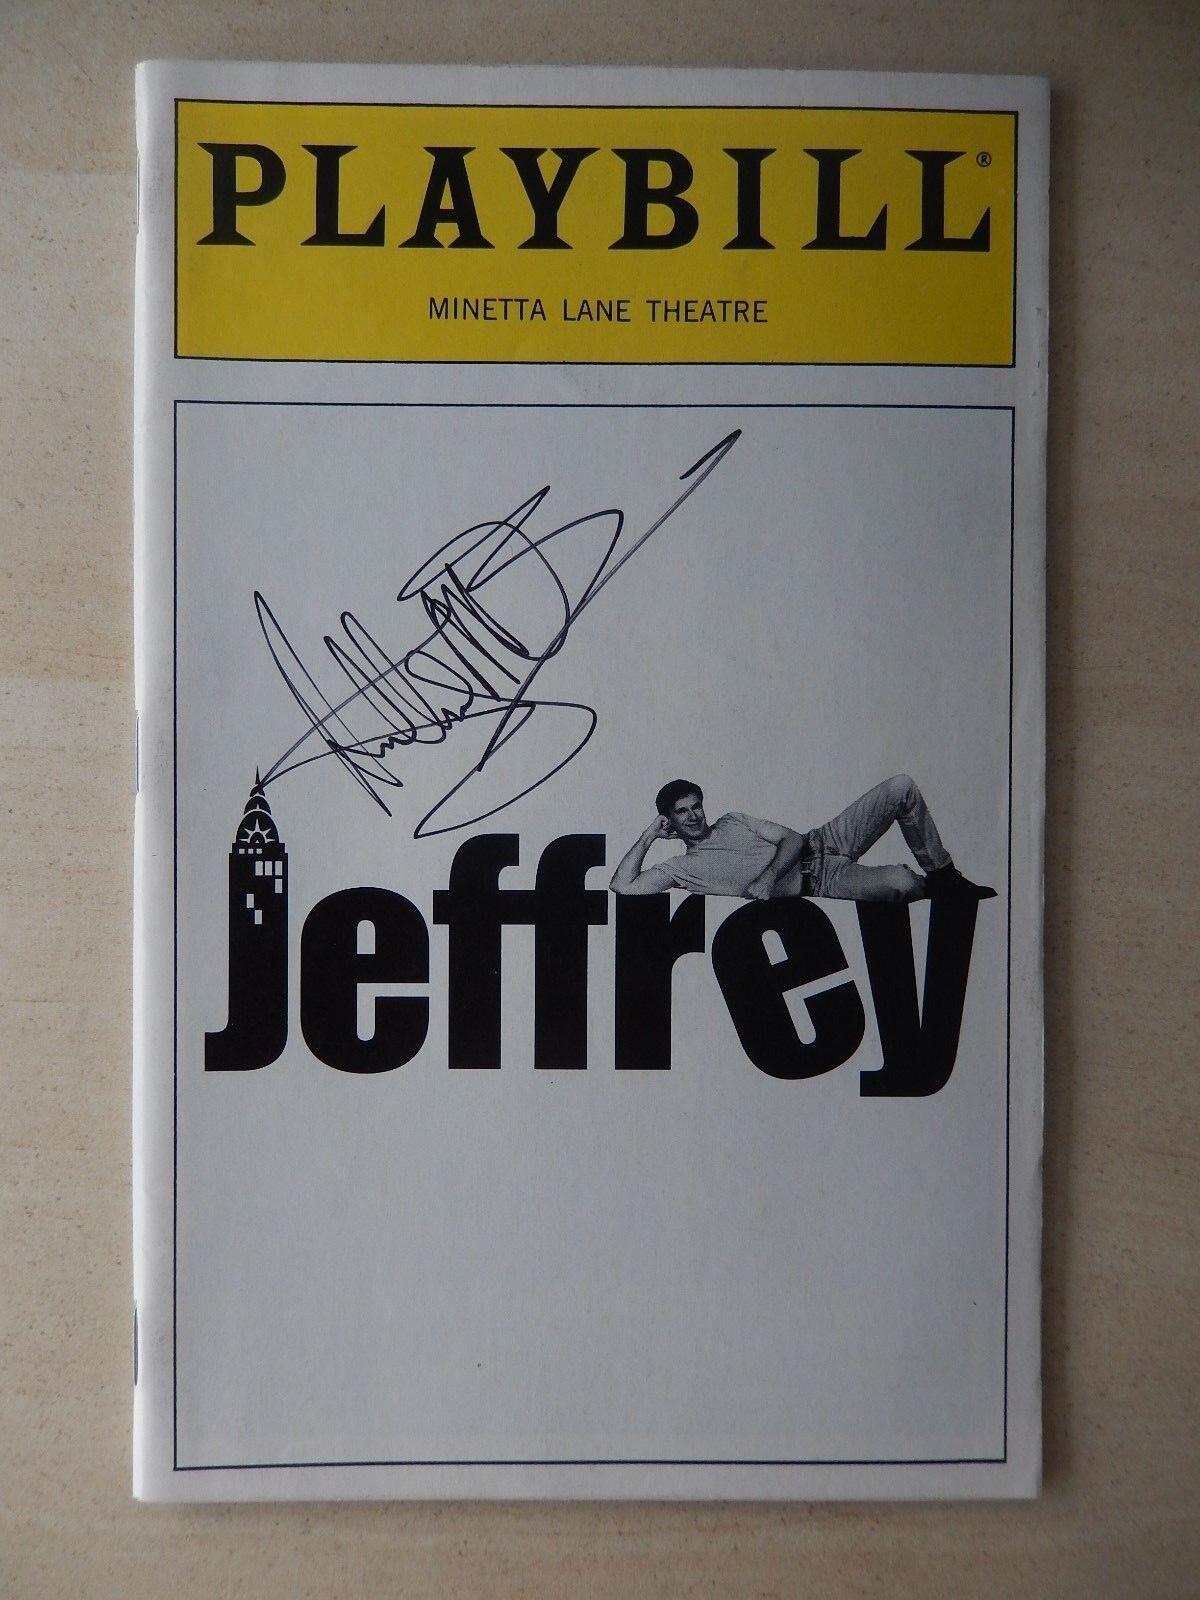 November 1993 - minetta lane playbill - jeffrey - anthony m brown - autographed